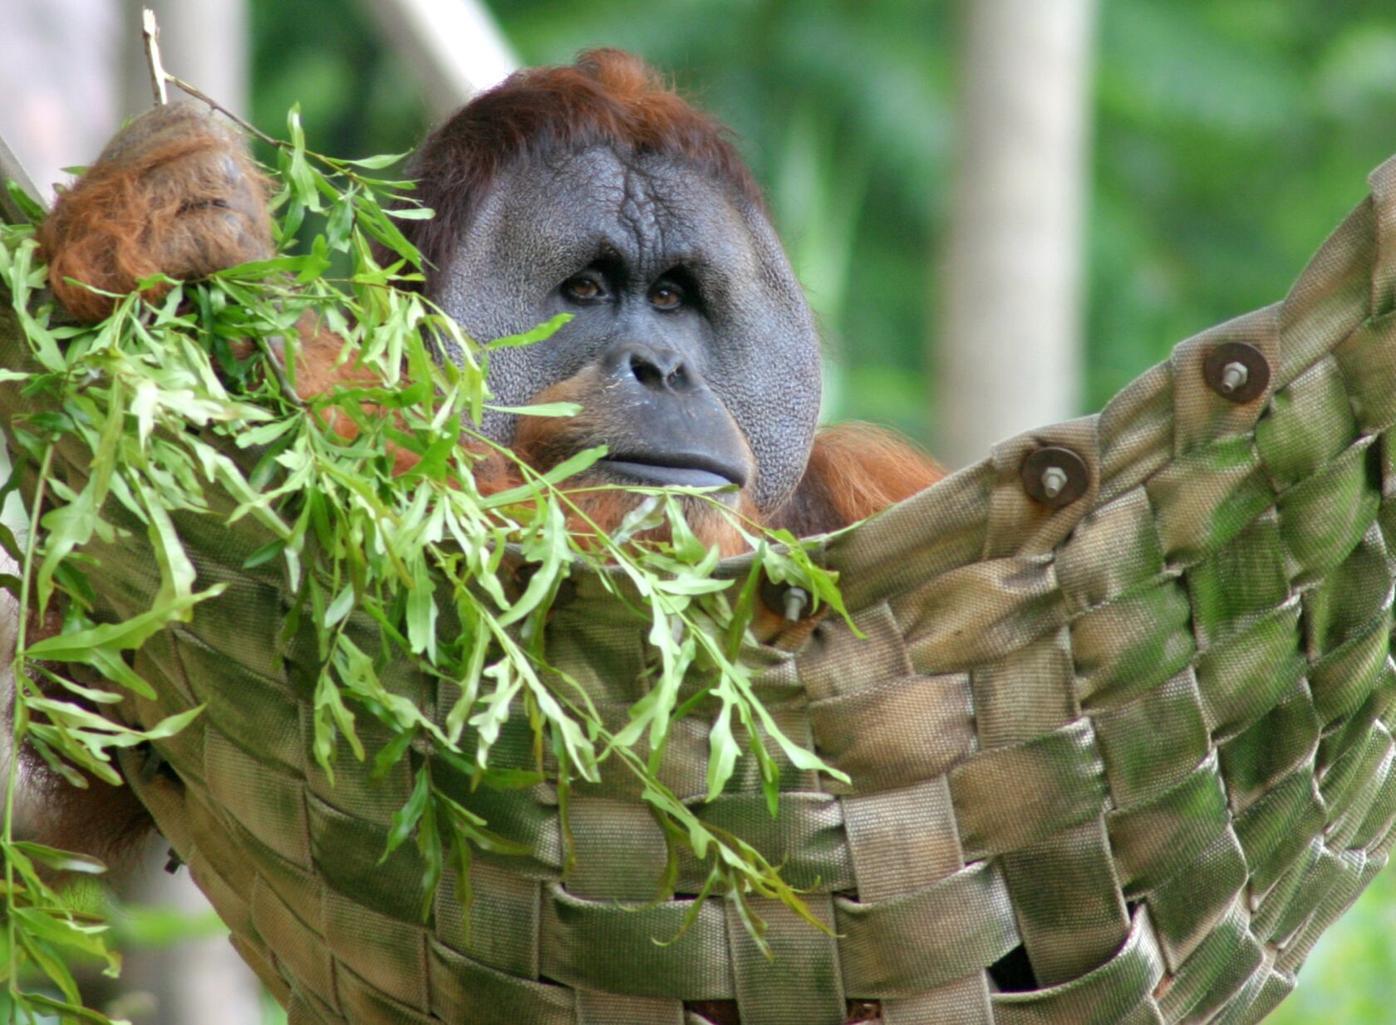 072920_MNS_full_zoo_plants_001 orangutan